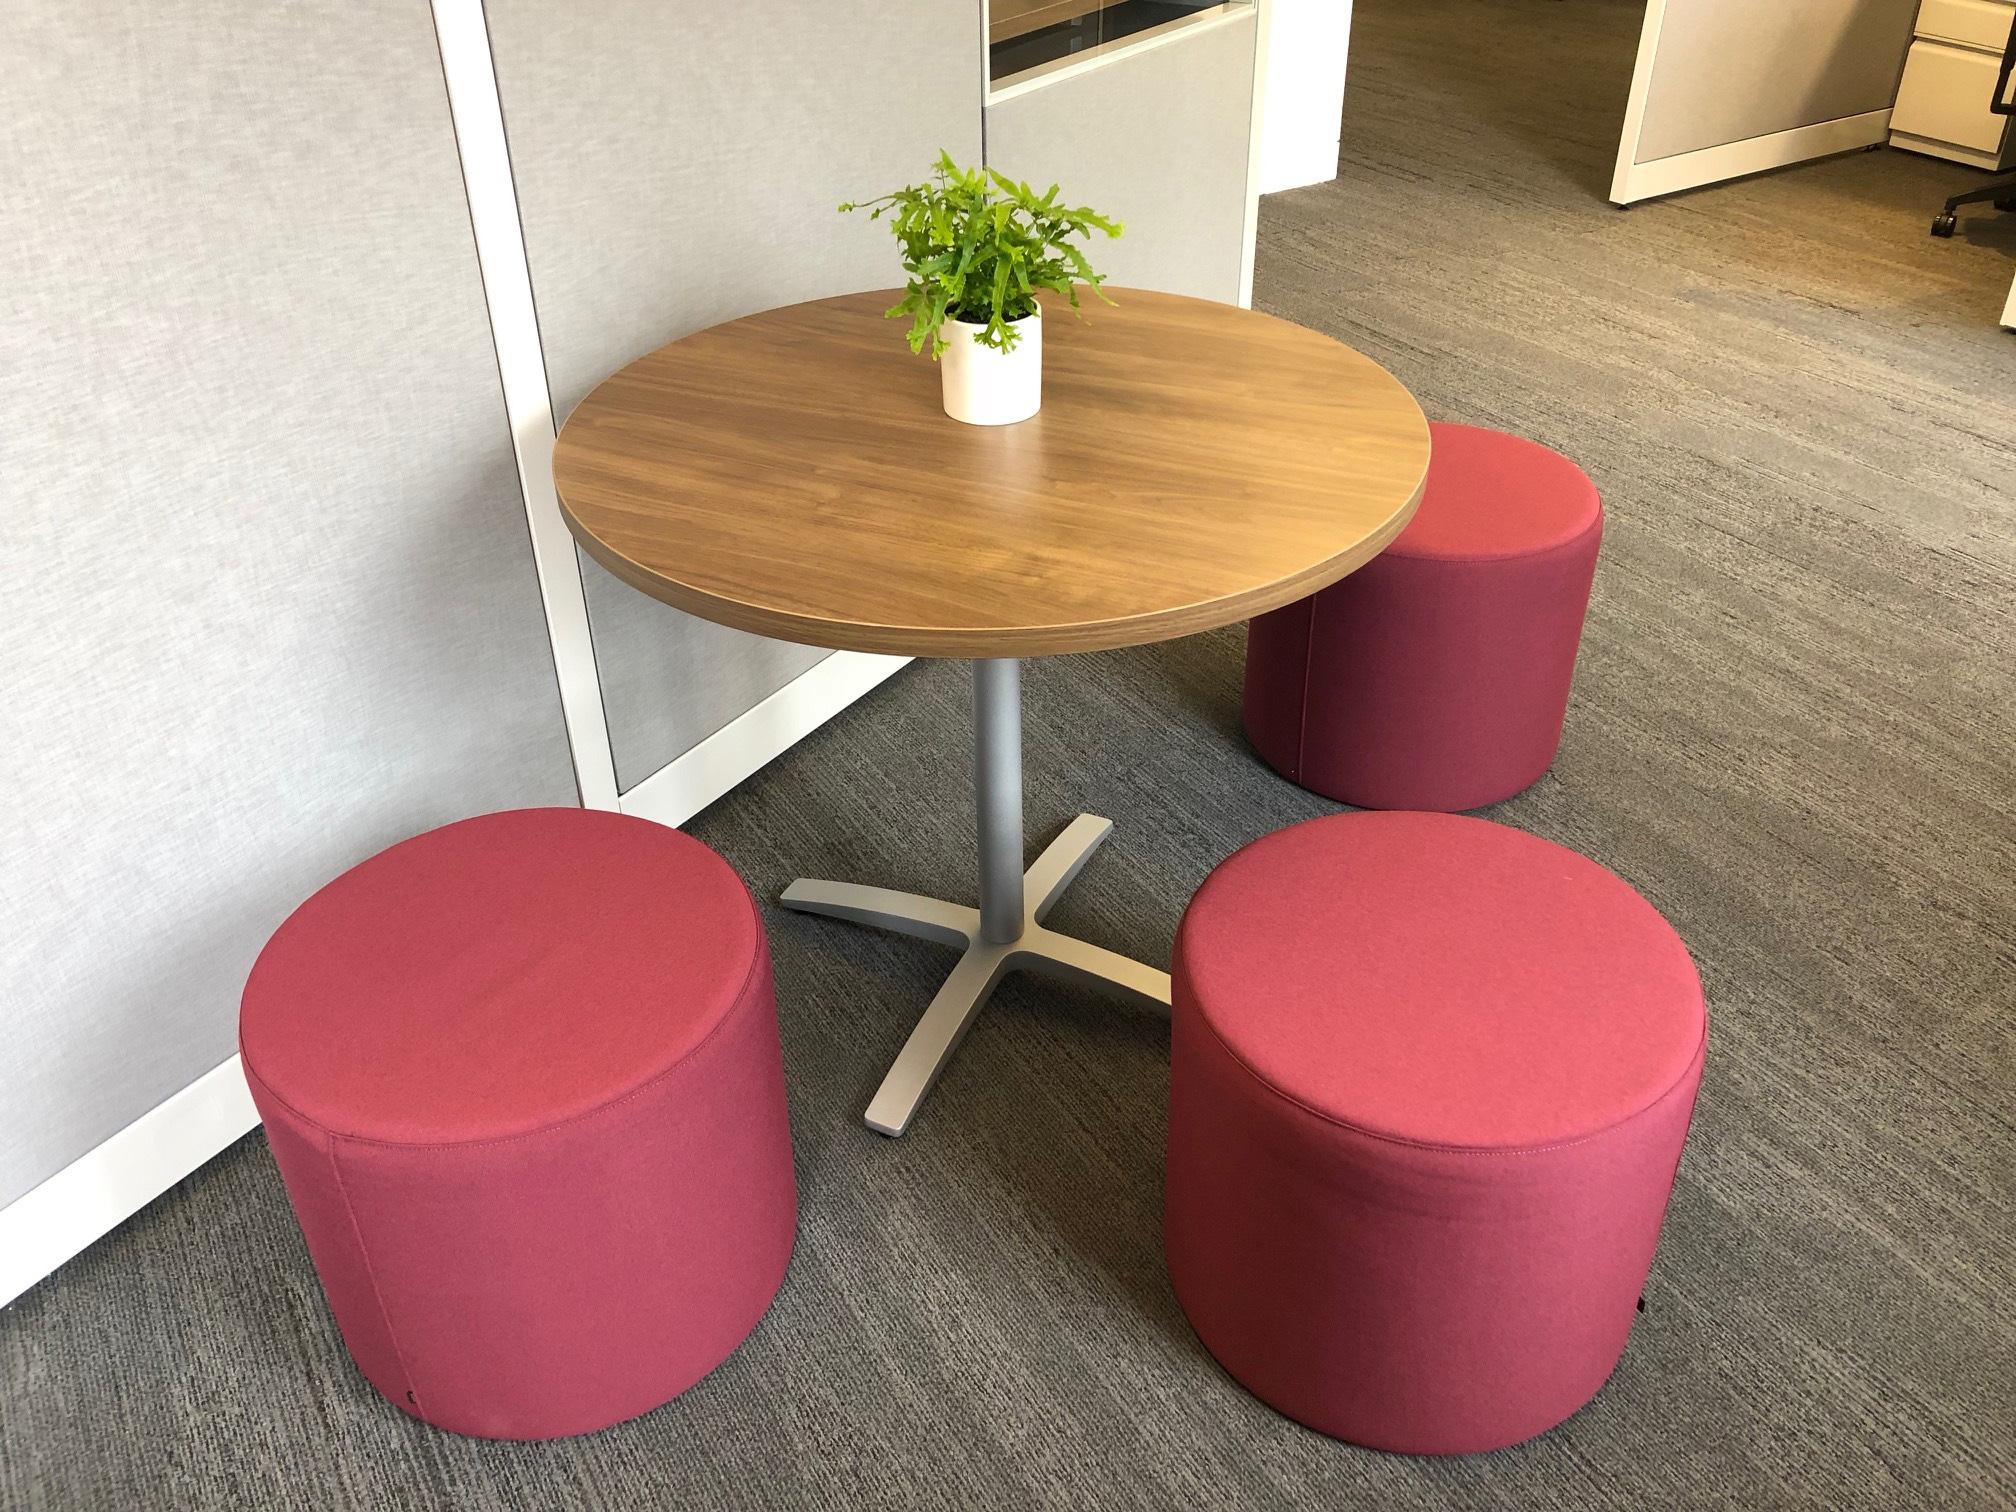 furniture-office-supplies-in-lakeland-florida-1.jpg